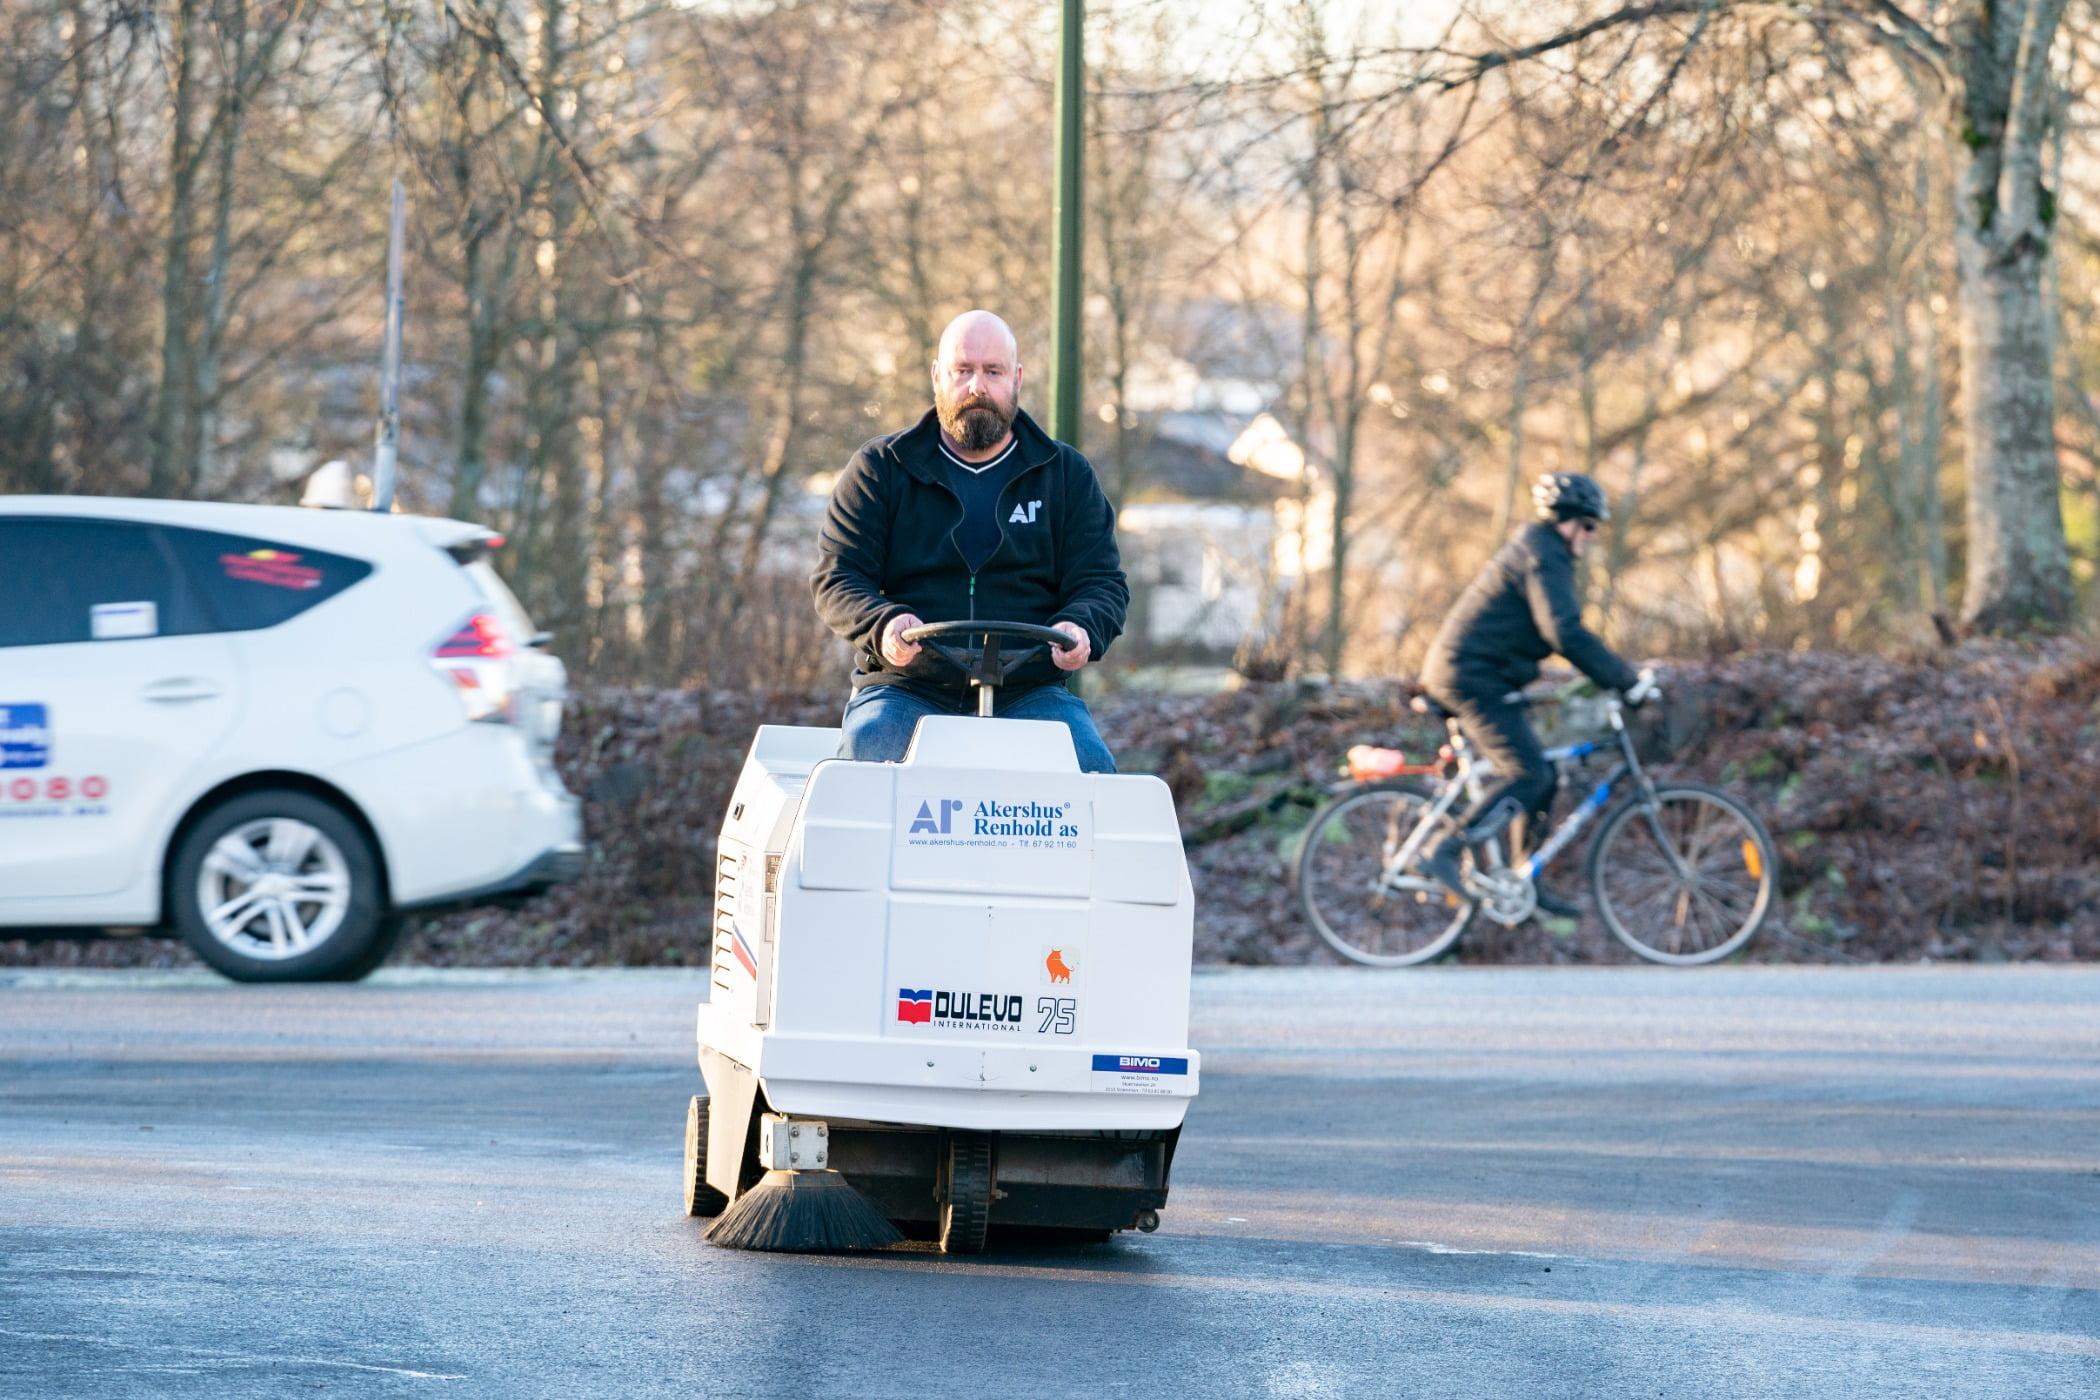 Mode of transport, Motor vehicle, Winter, Lane, Cycling, Bicycle